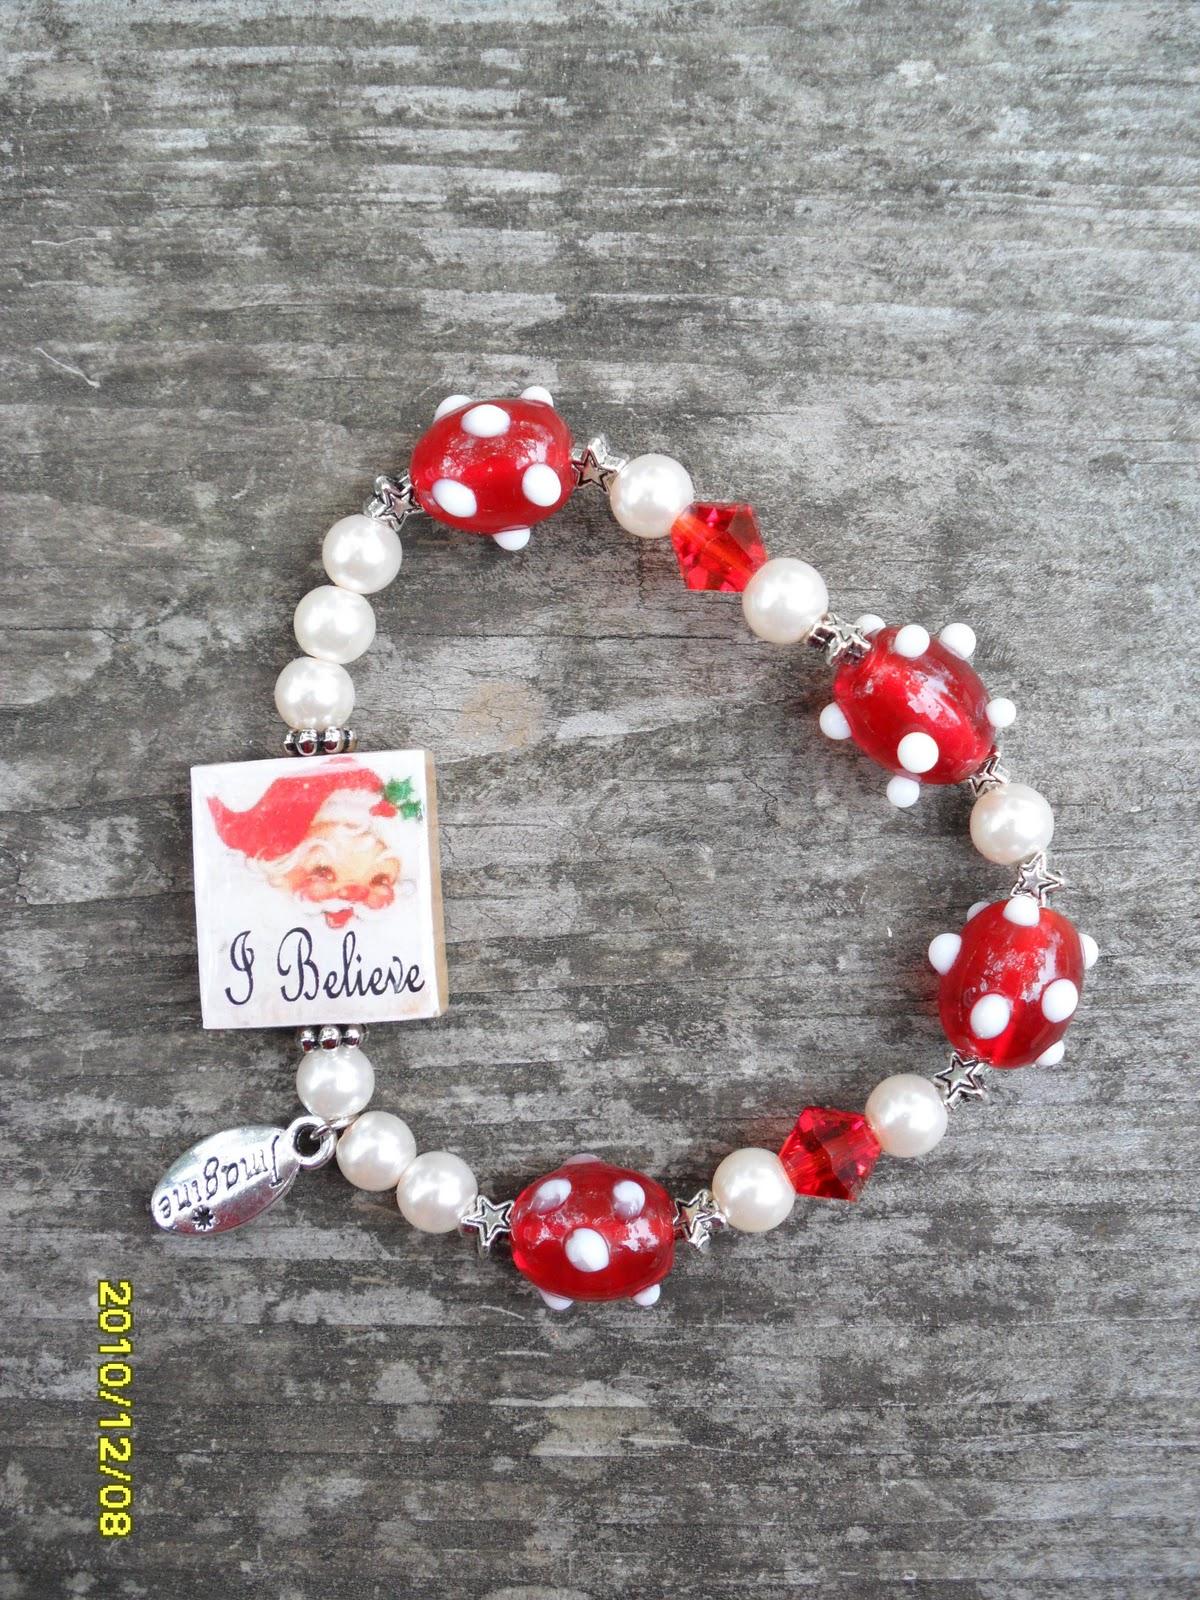 http://2.bp.blogspot.com/_FSejWffKpkM/TQLn3VioKPI/AAAAAAAAAIg/HGT3hPNwYrs/s1600/I+Believe+Santa+Bracelet1.JPG